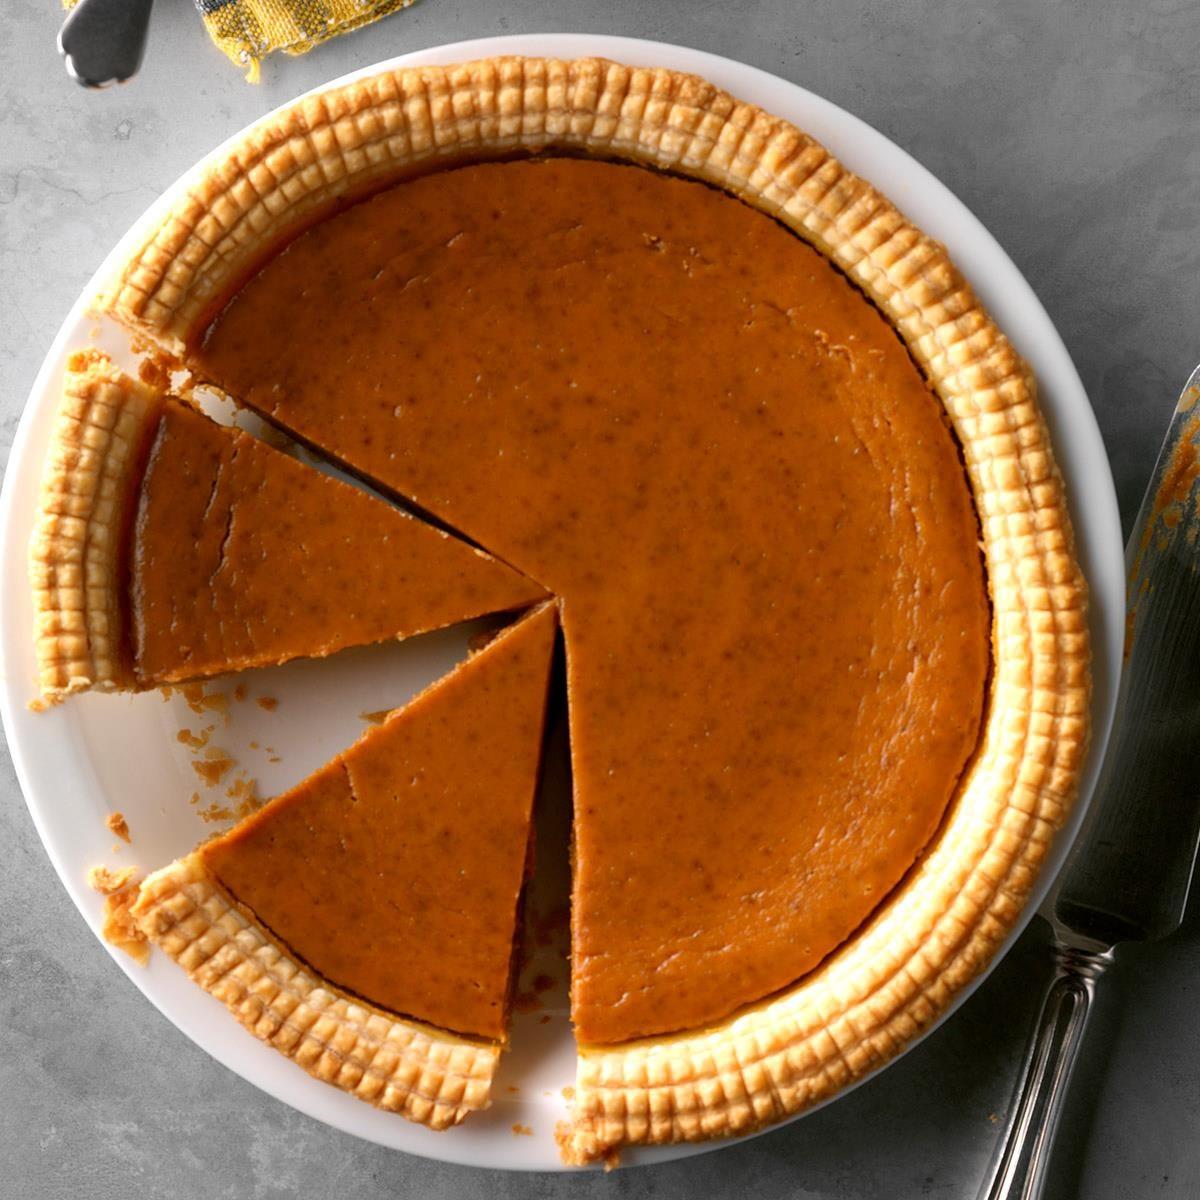 Missouri: Spiced Eggnog Pumpkin Pie